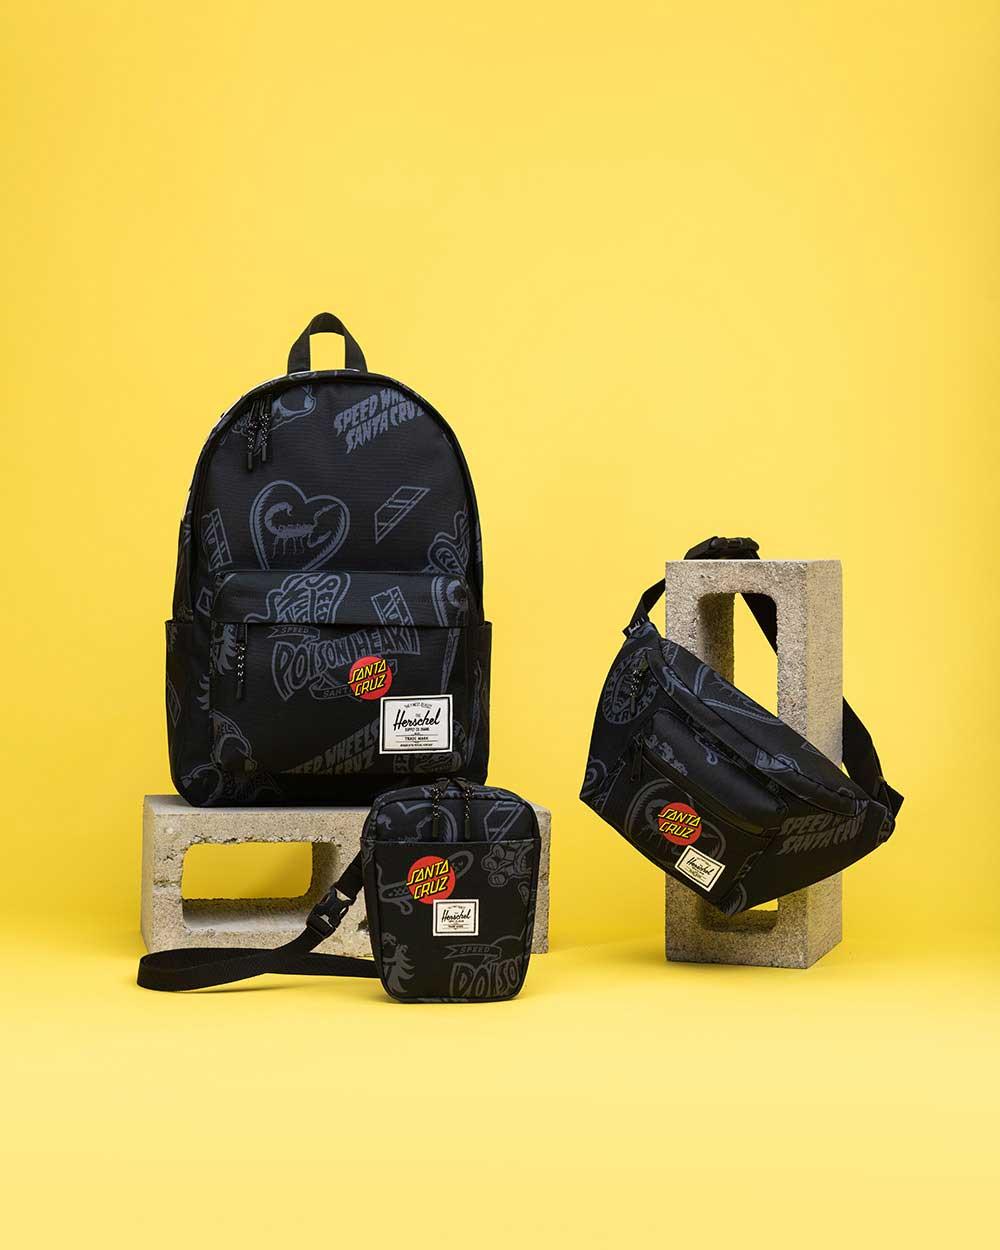 Un sac à dos Santa Cruz Classic XL, un sac bandoulière Cruz et un sac banane Seventeen avec imprimé noir Speed Wheels